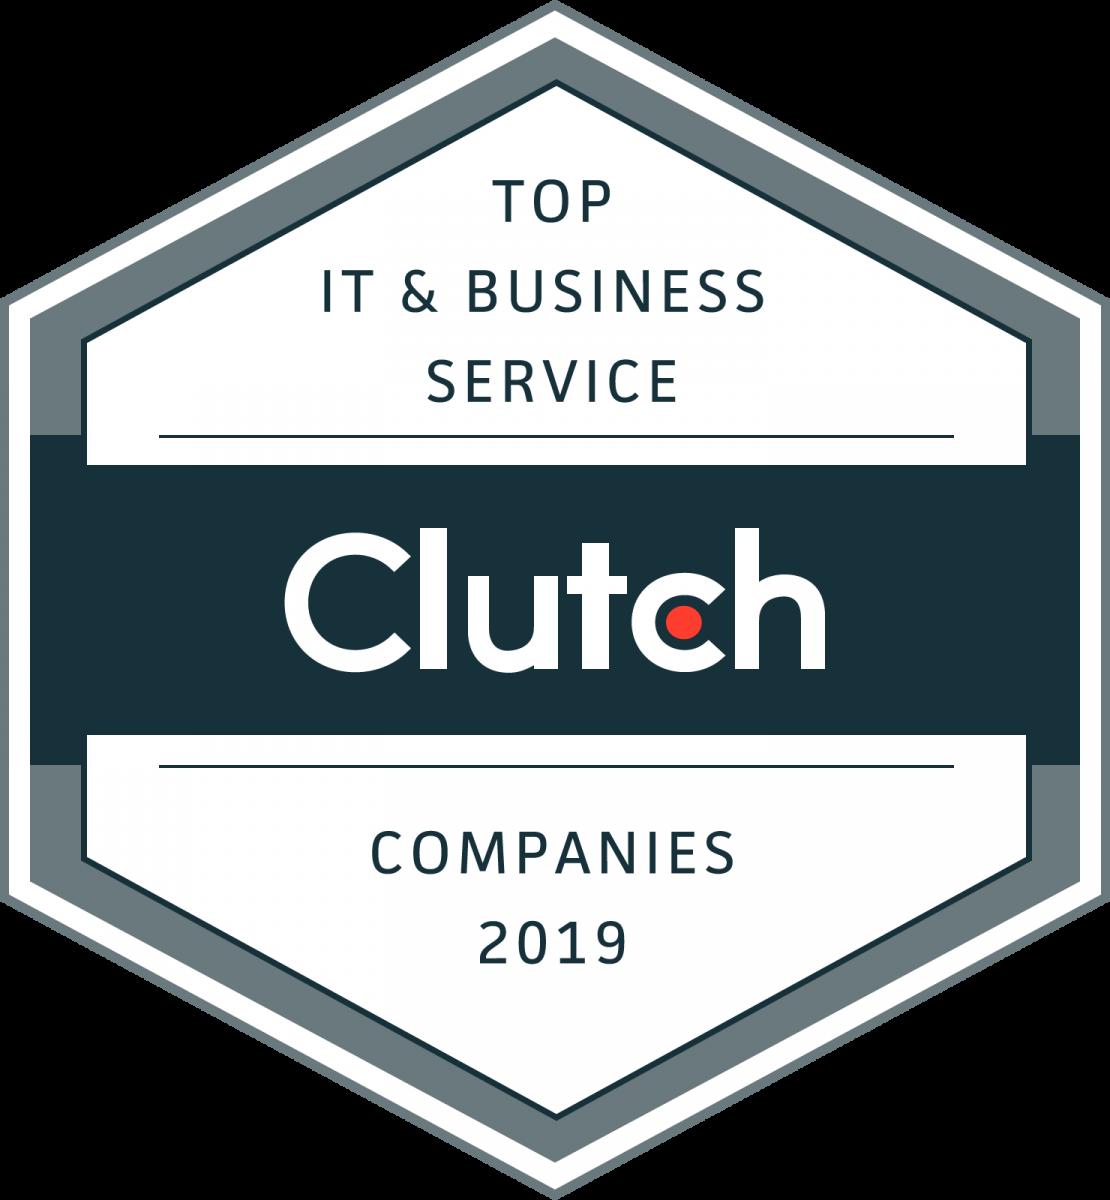 clutch ardem top data company